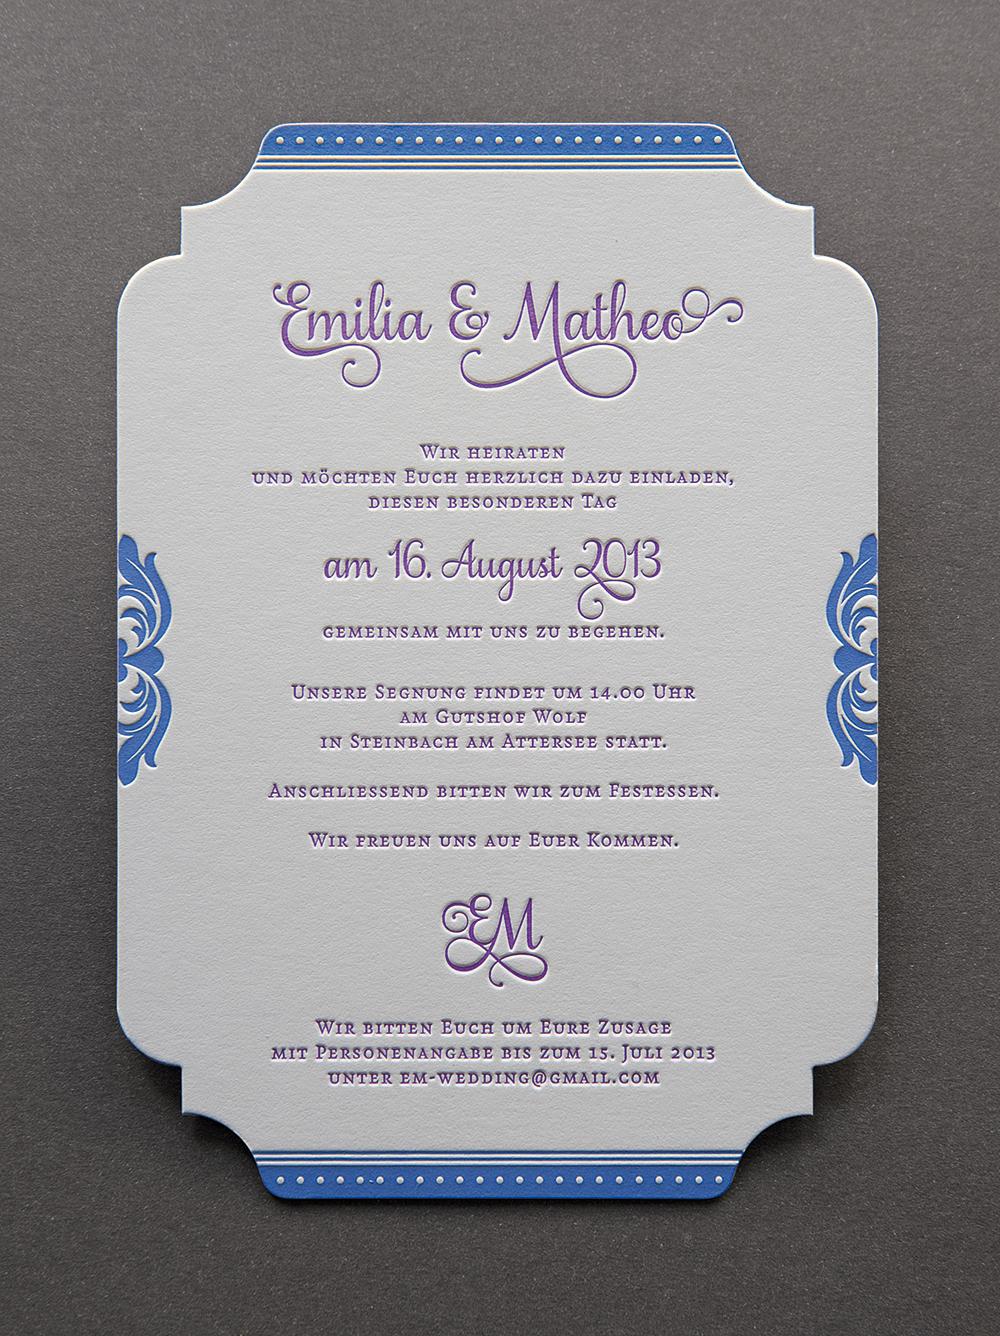 Hochzeit Emilia & Matheo